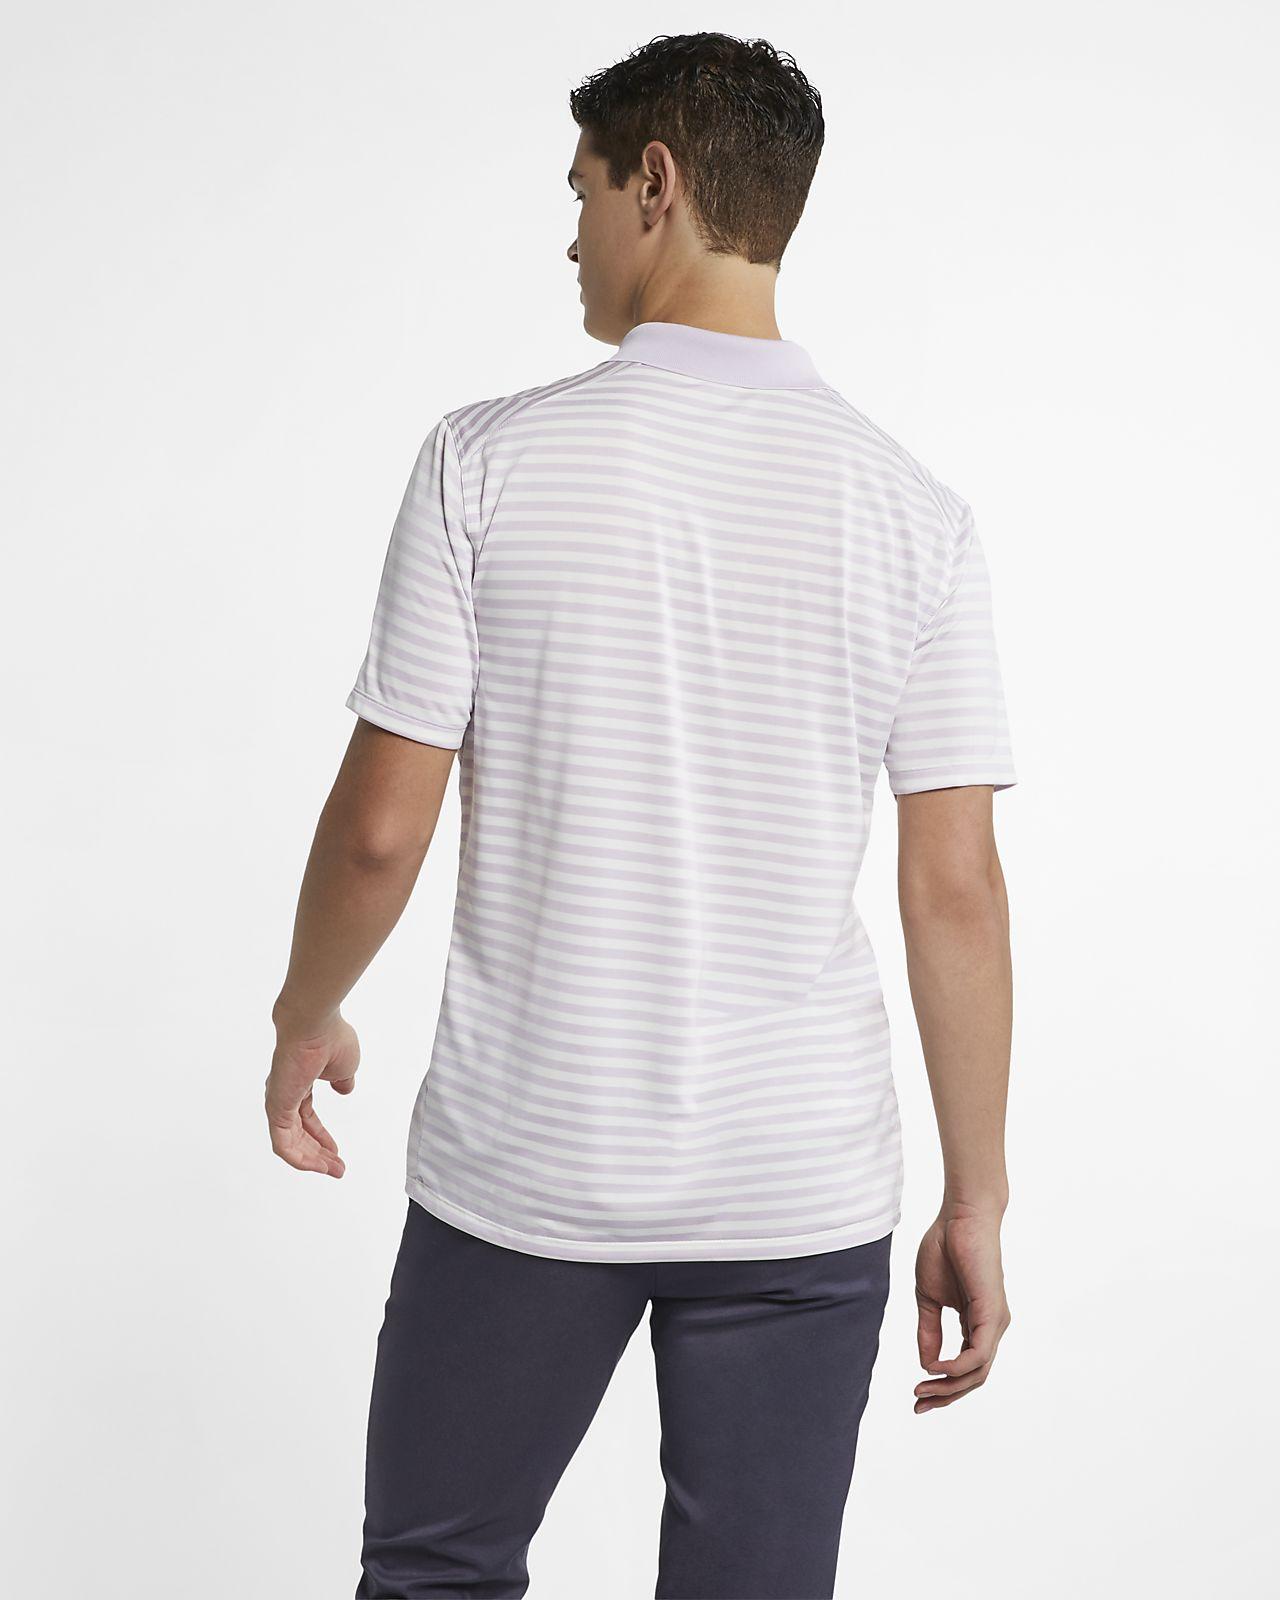 8b97c85b Nike Dri-FIT Victory Men's Striped Golf Polo. Nike.com